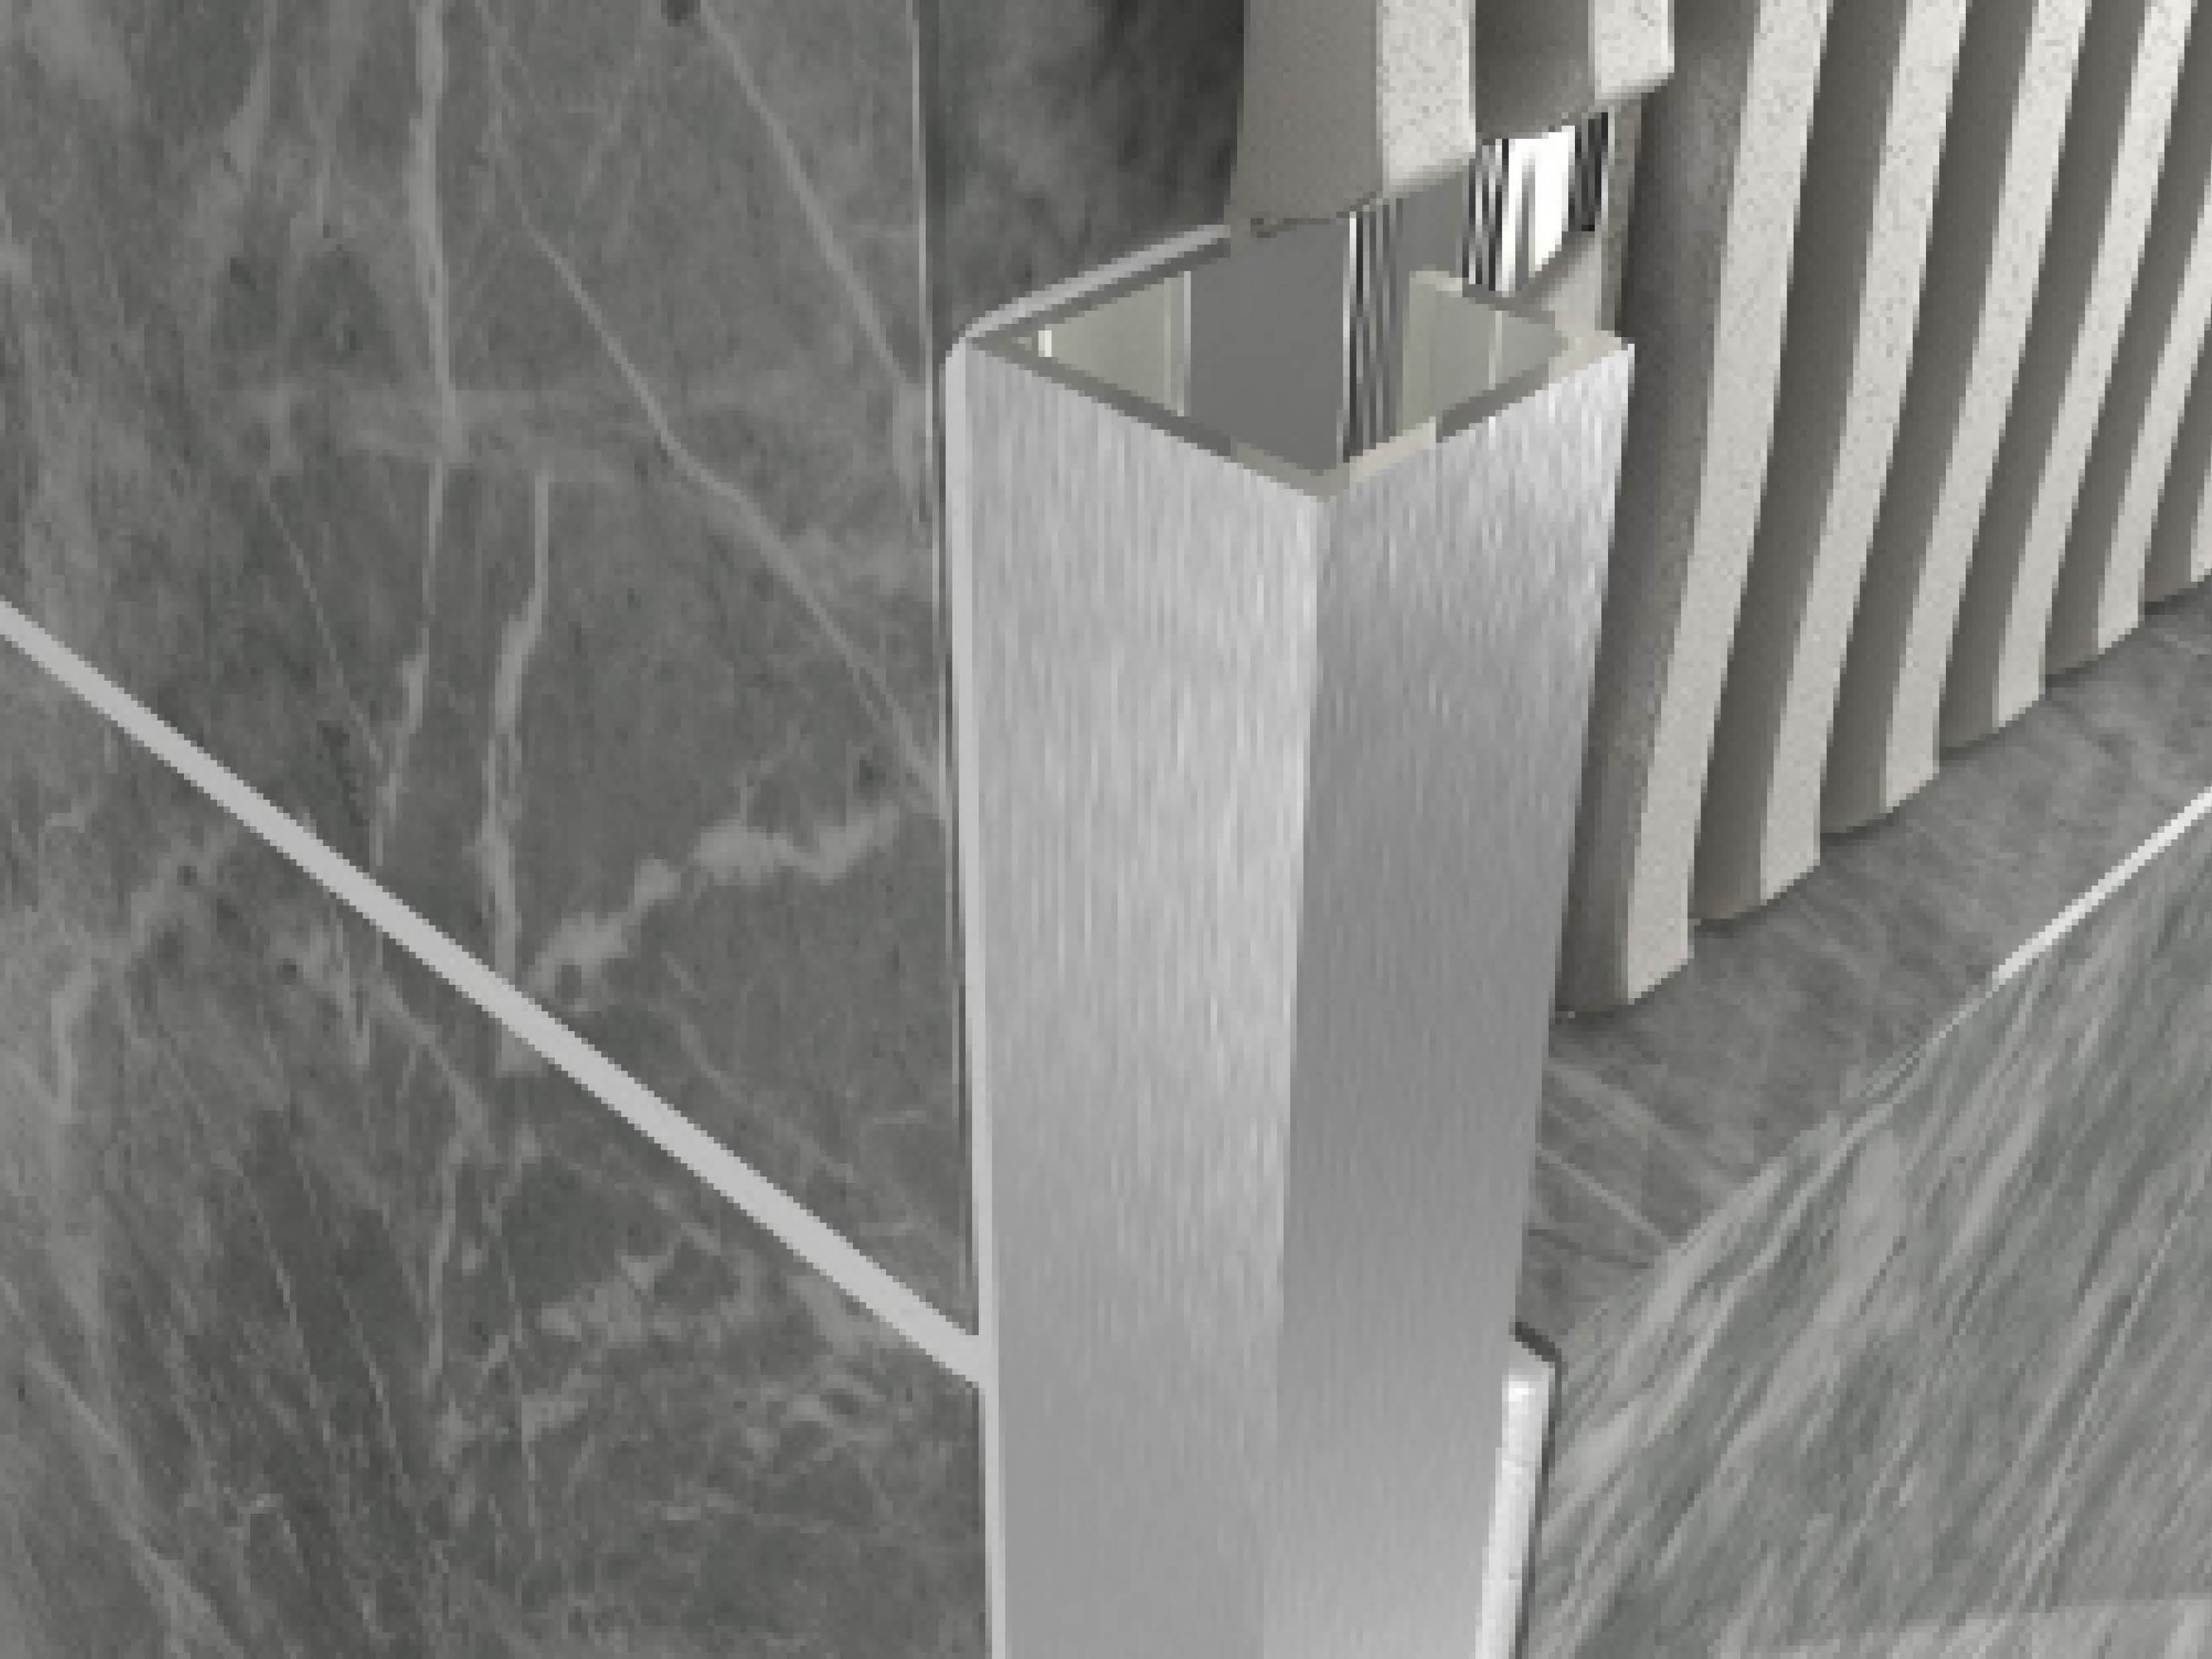 Atrim Metal Cubec Trim 2.5m